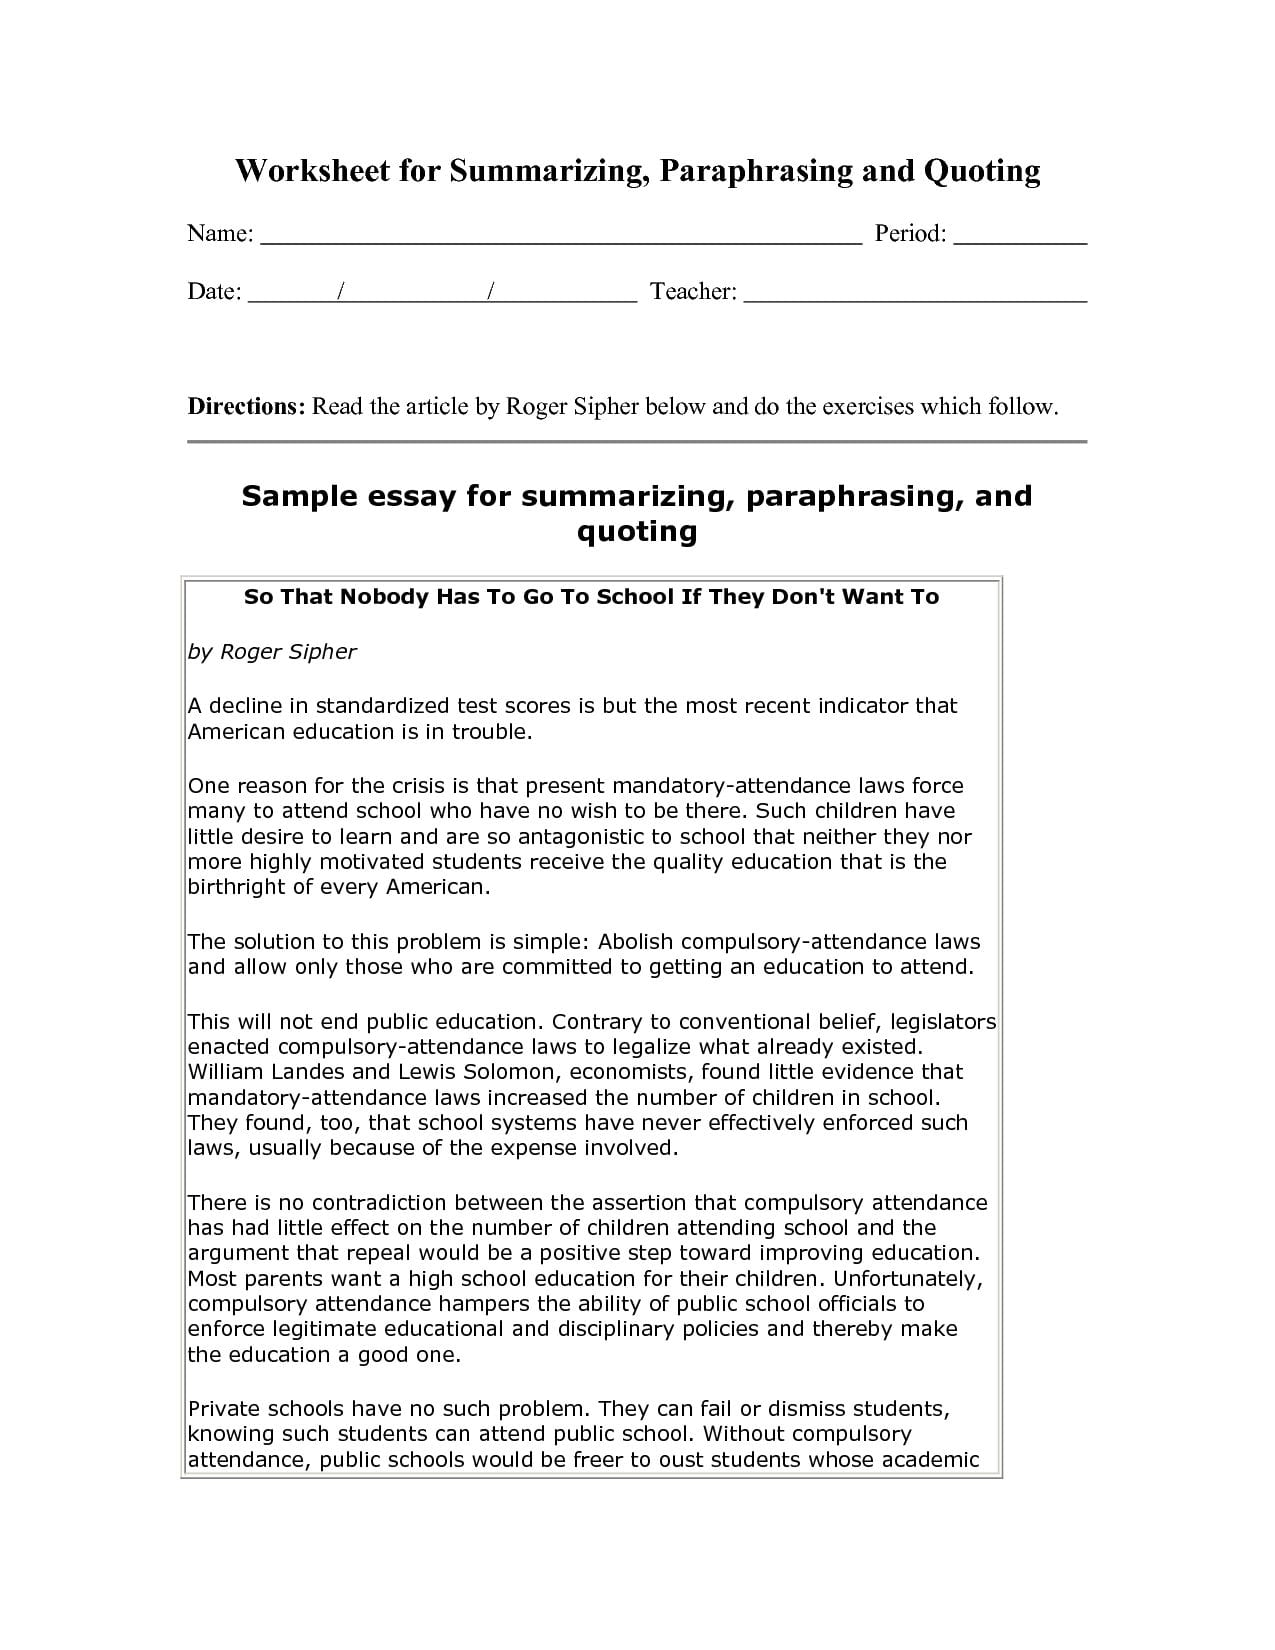 Example Of Summarizing Worksheets  Have Fun Summarizing Throughout Summarizing Worksheets Pdf